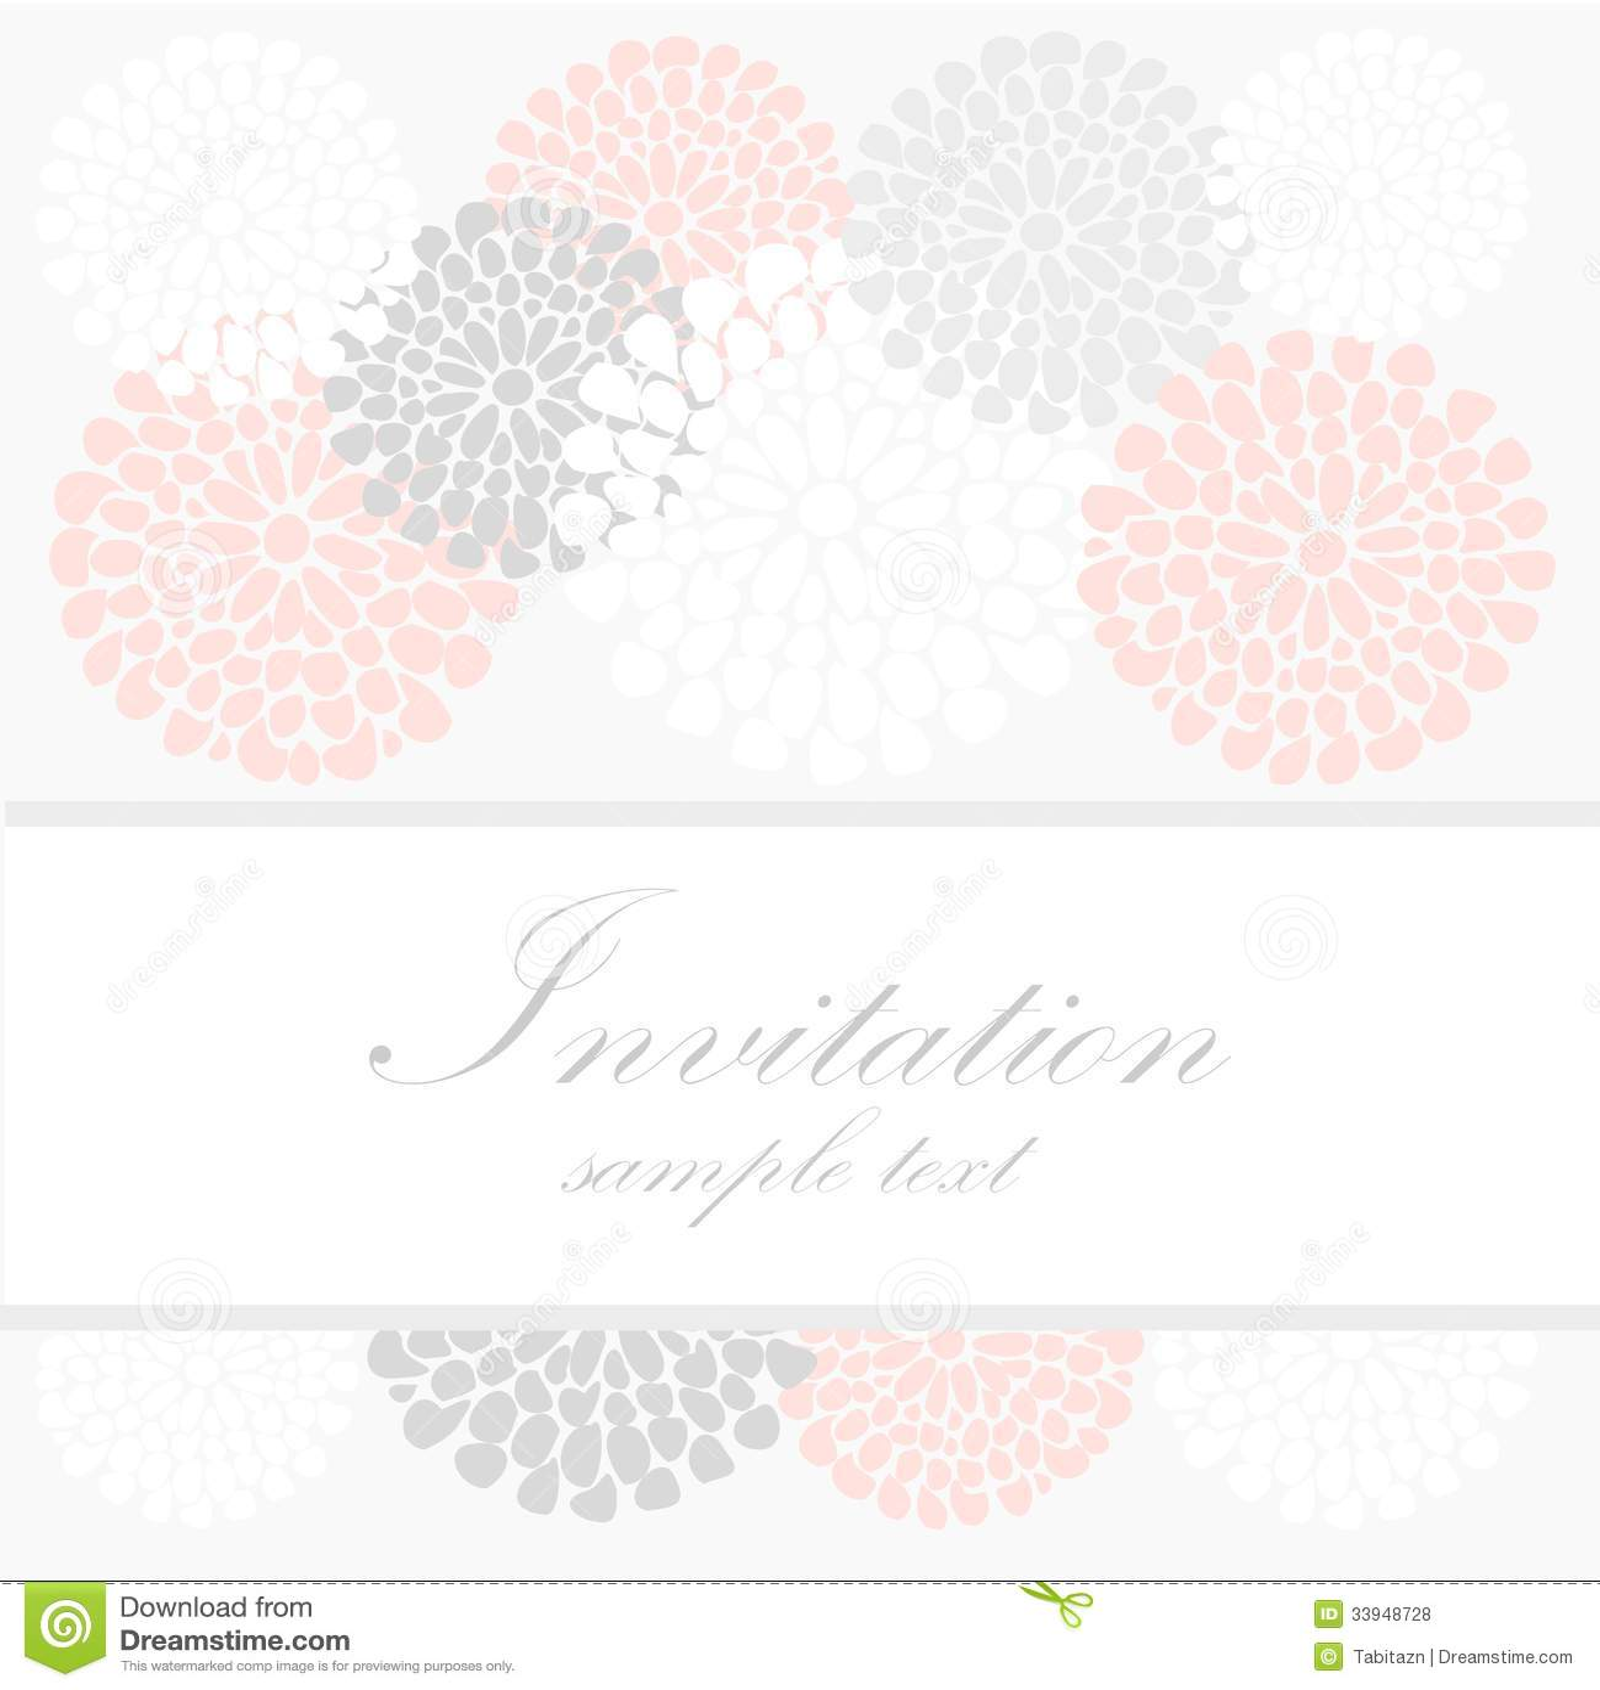 Classy Invitation Templates is perfect invitation layout